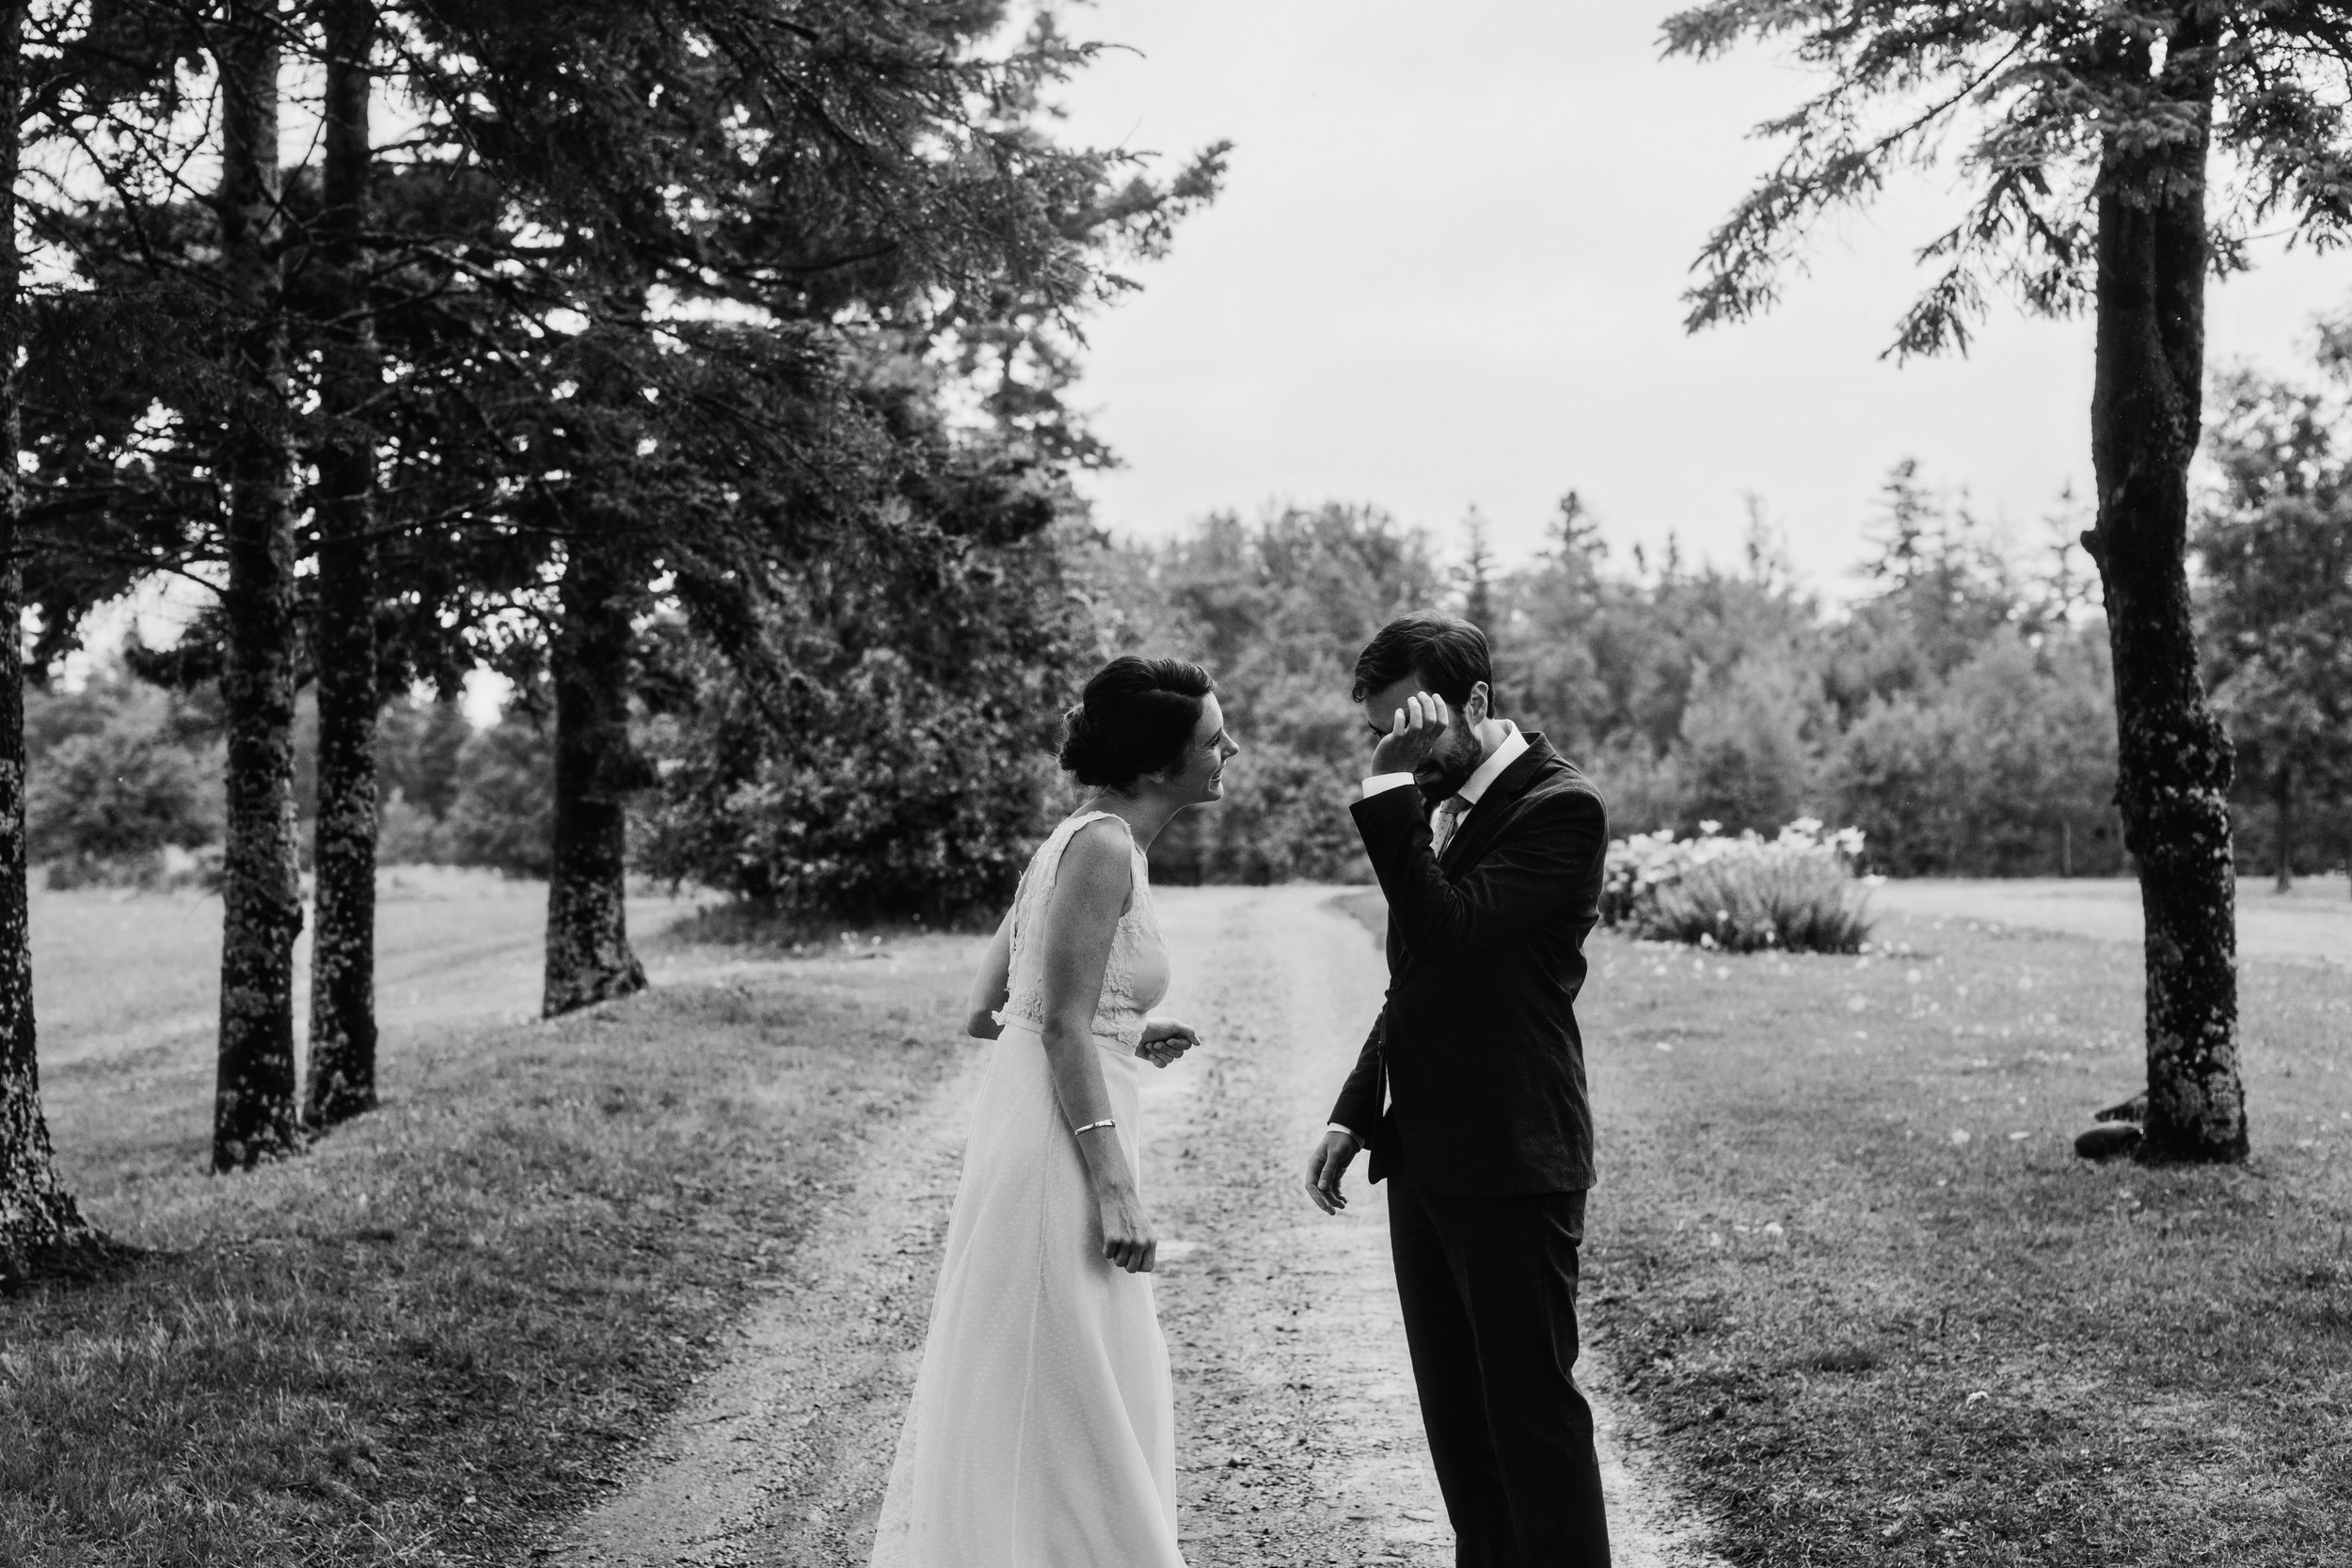 prince-edward-island-cottage-wedding-photos-0044.JPG